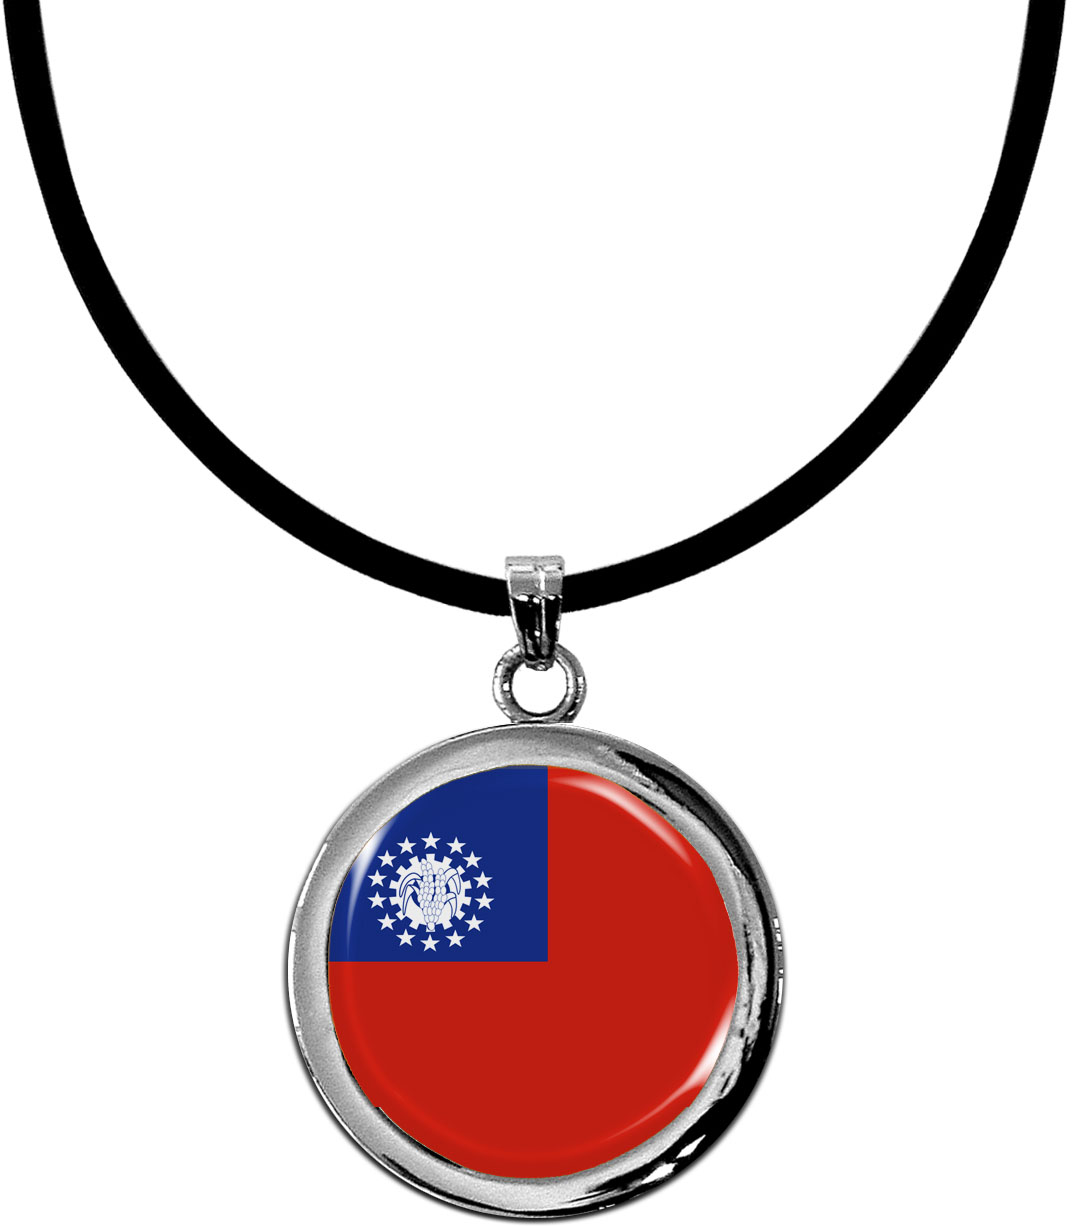 Kettenanhänger / Myanmar / Silikonband mit Silberverschluss